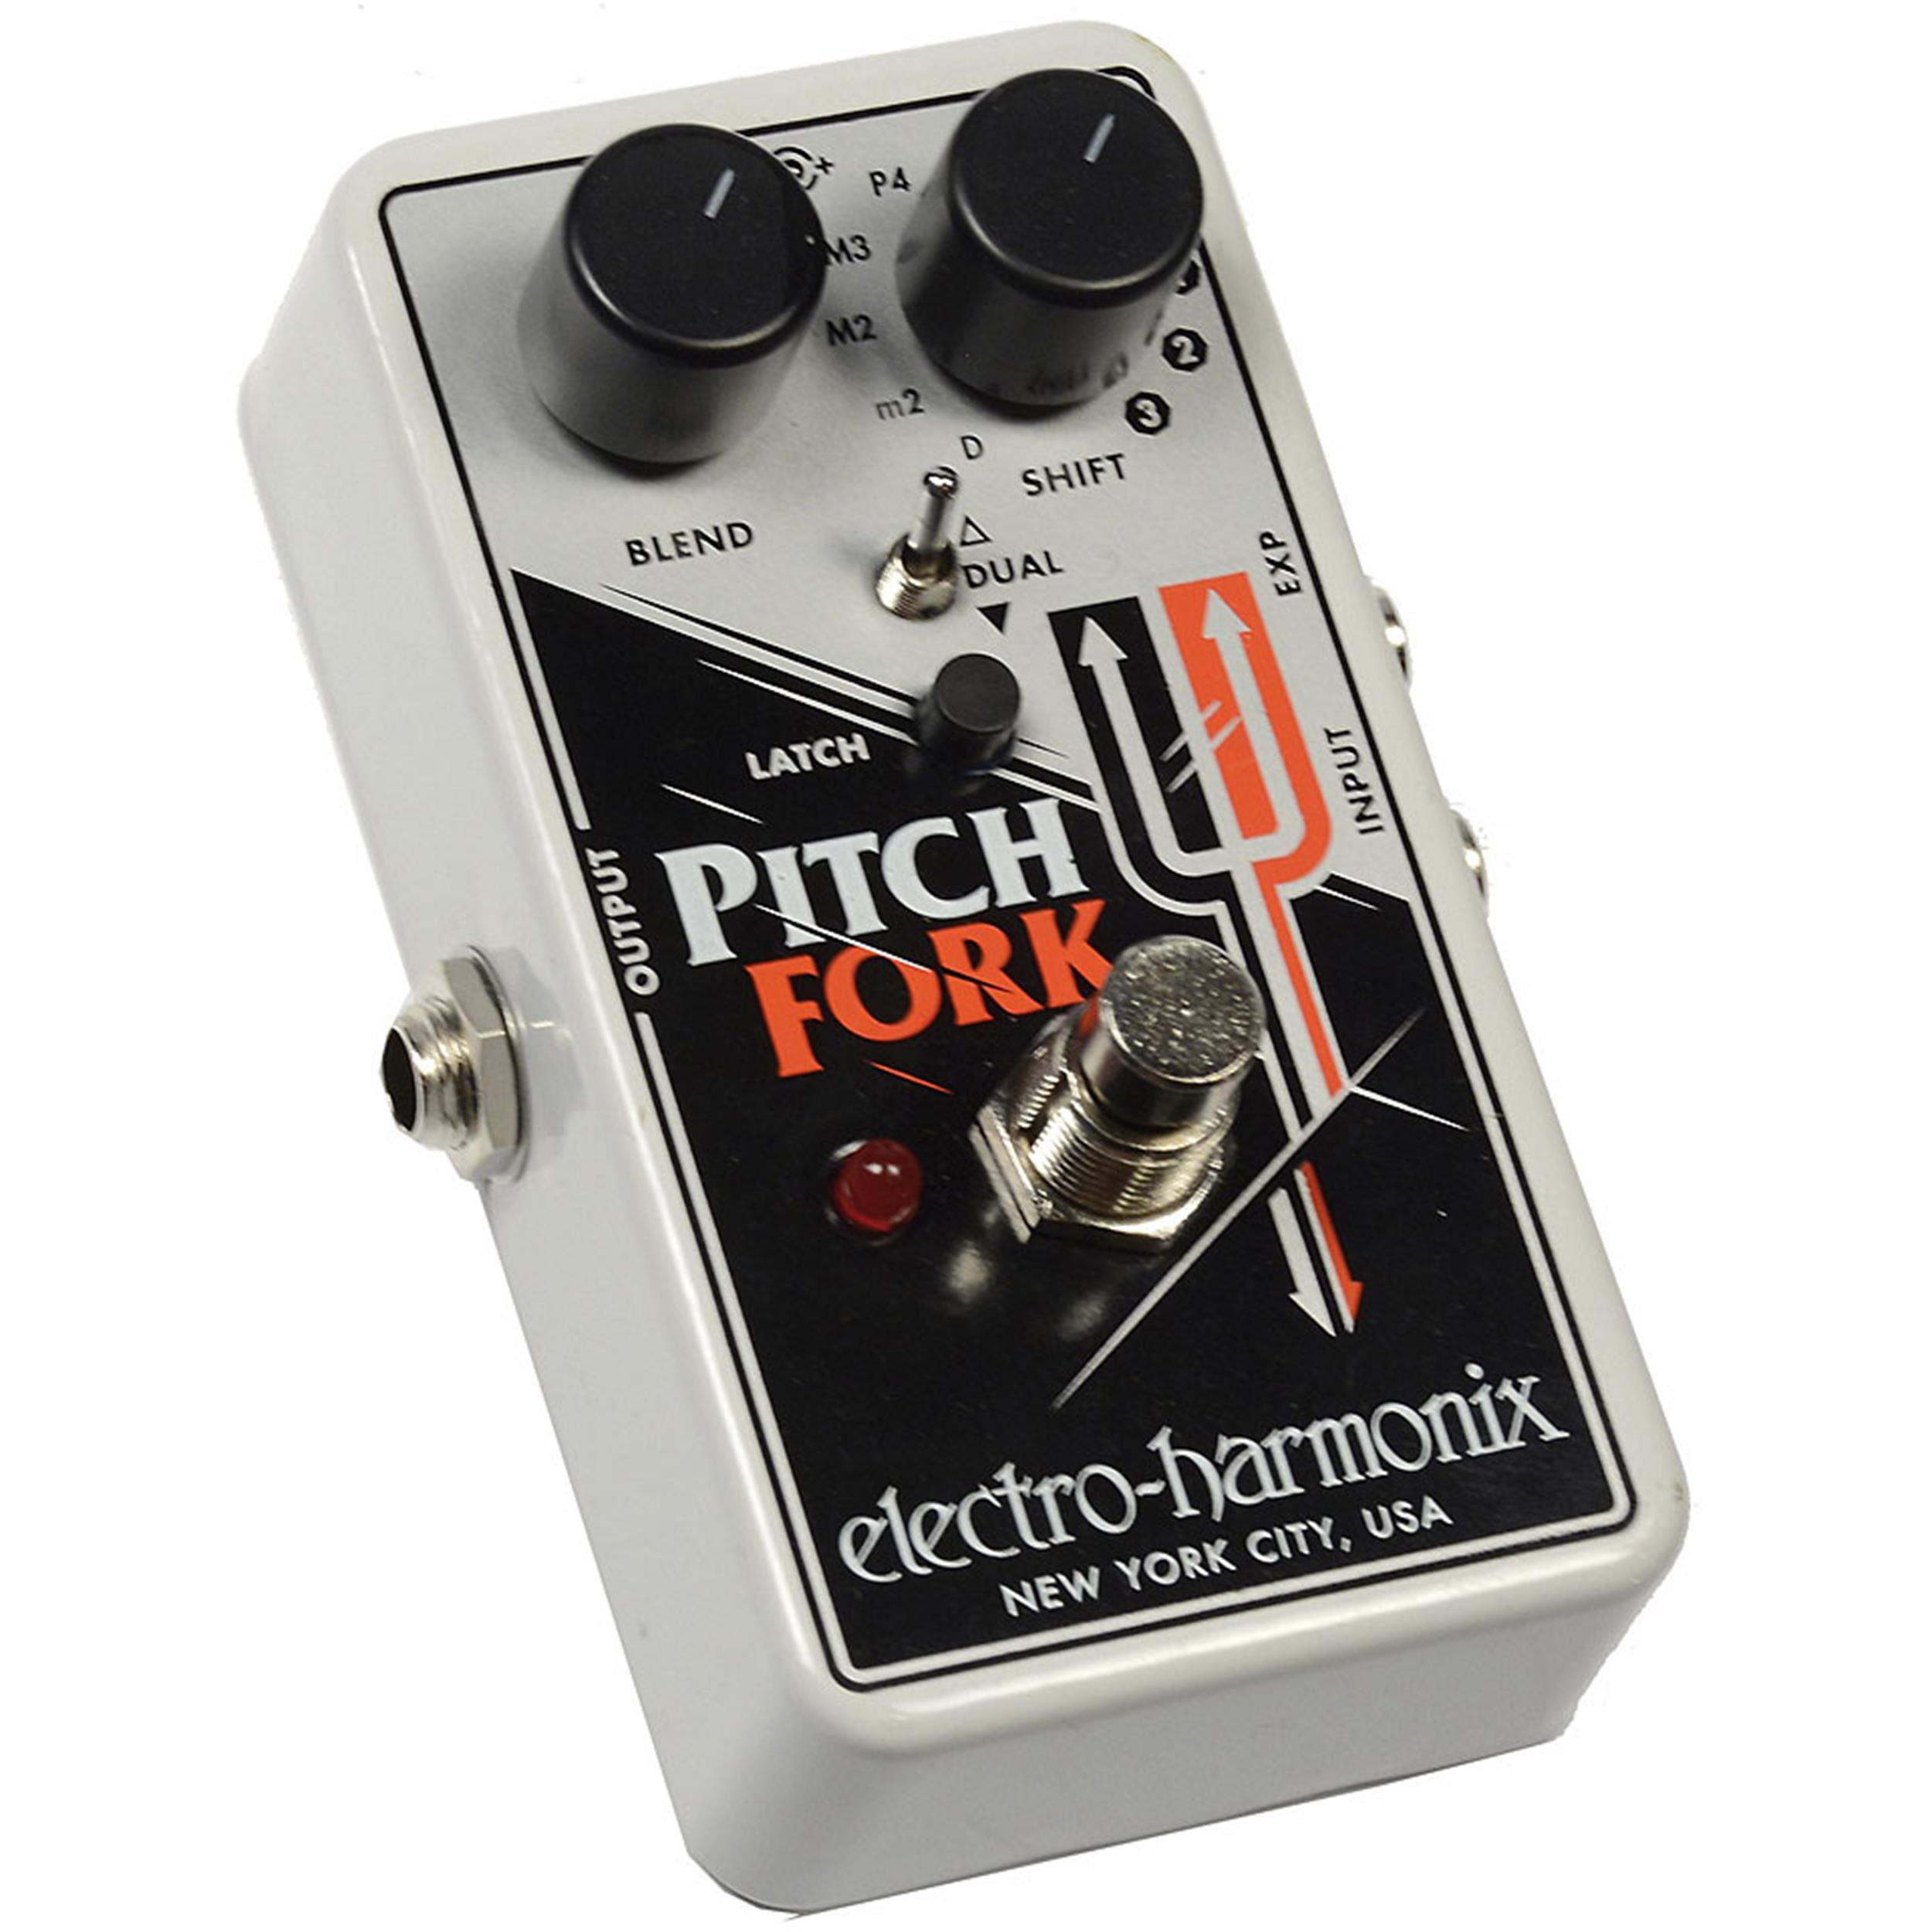 ELECTRO-HARMONIX-PITCH-FORK-sku-12807